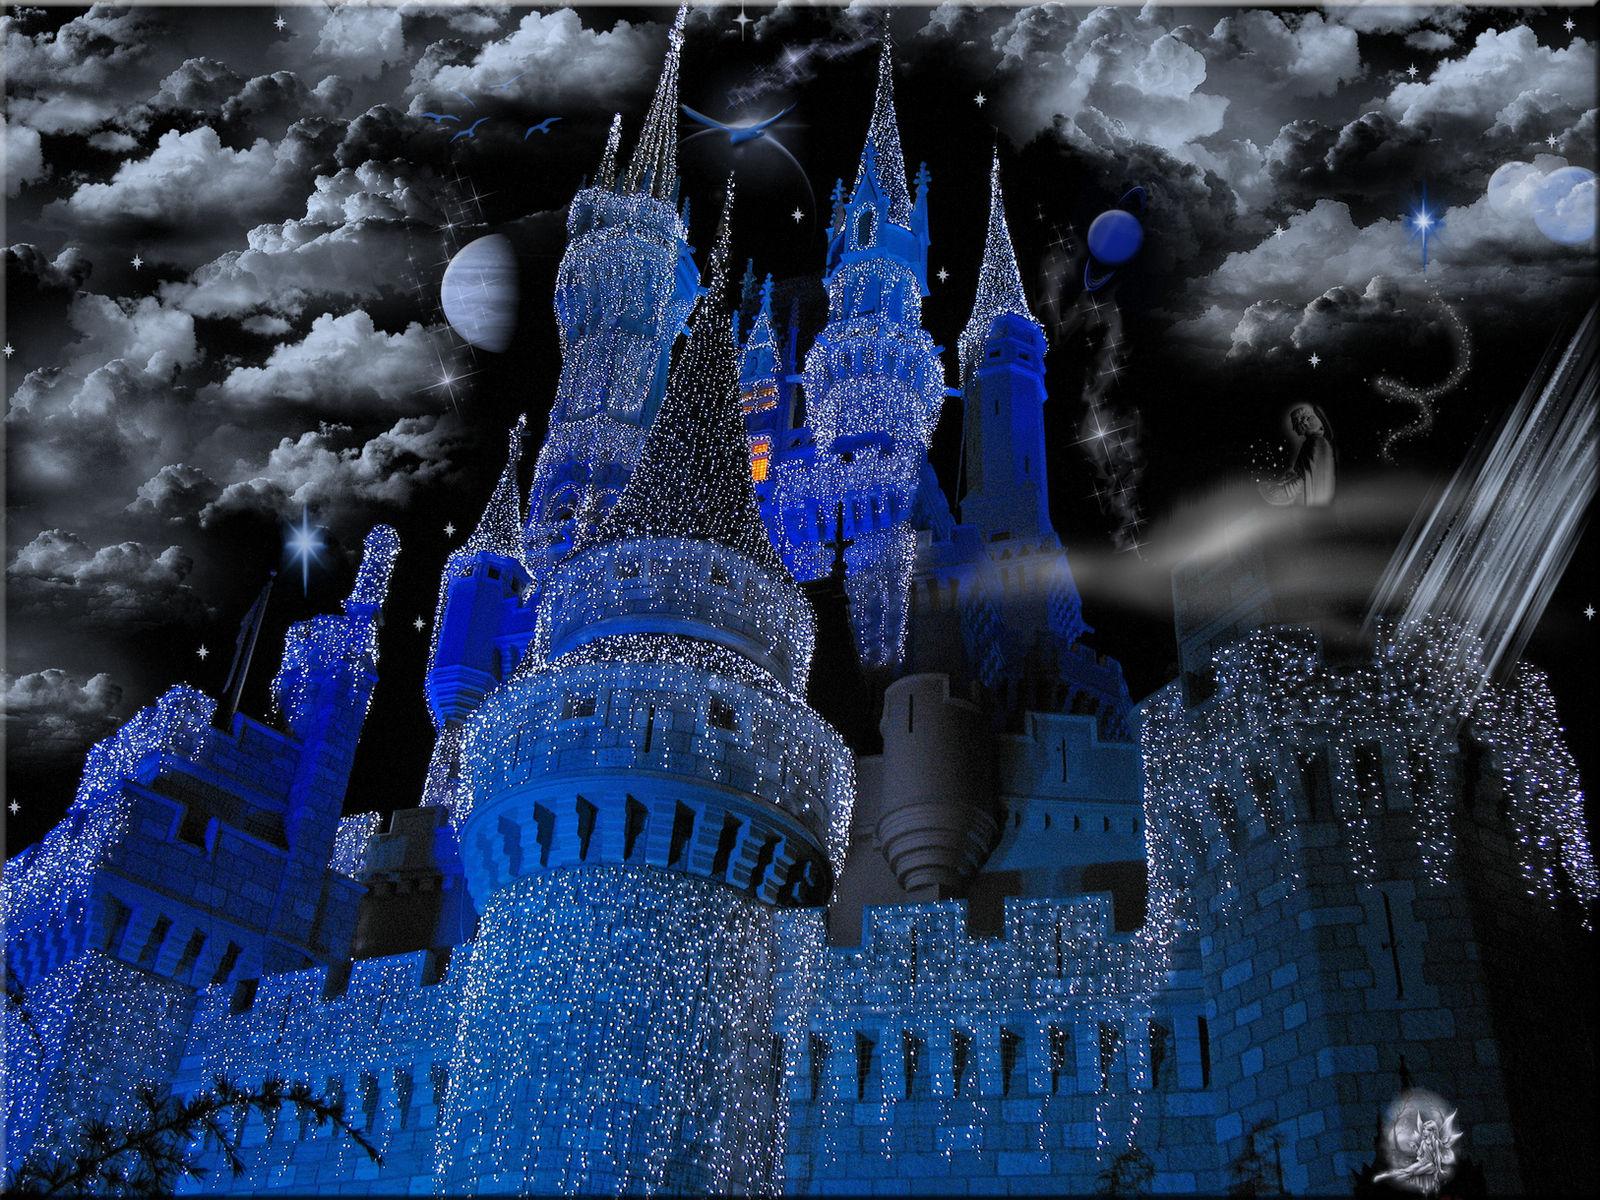 Cinderella Castle Christmas.Cinderella Castle Christmas By Wdwparksgal On Deviantart